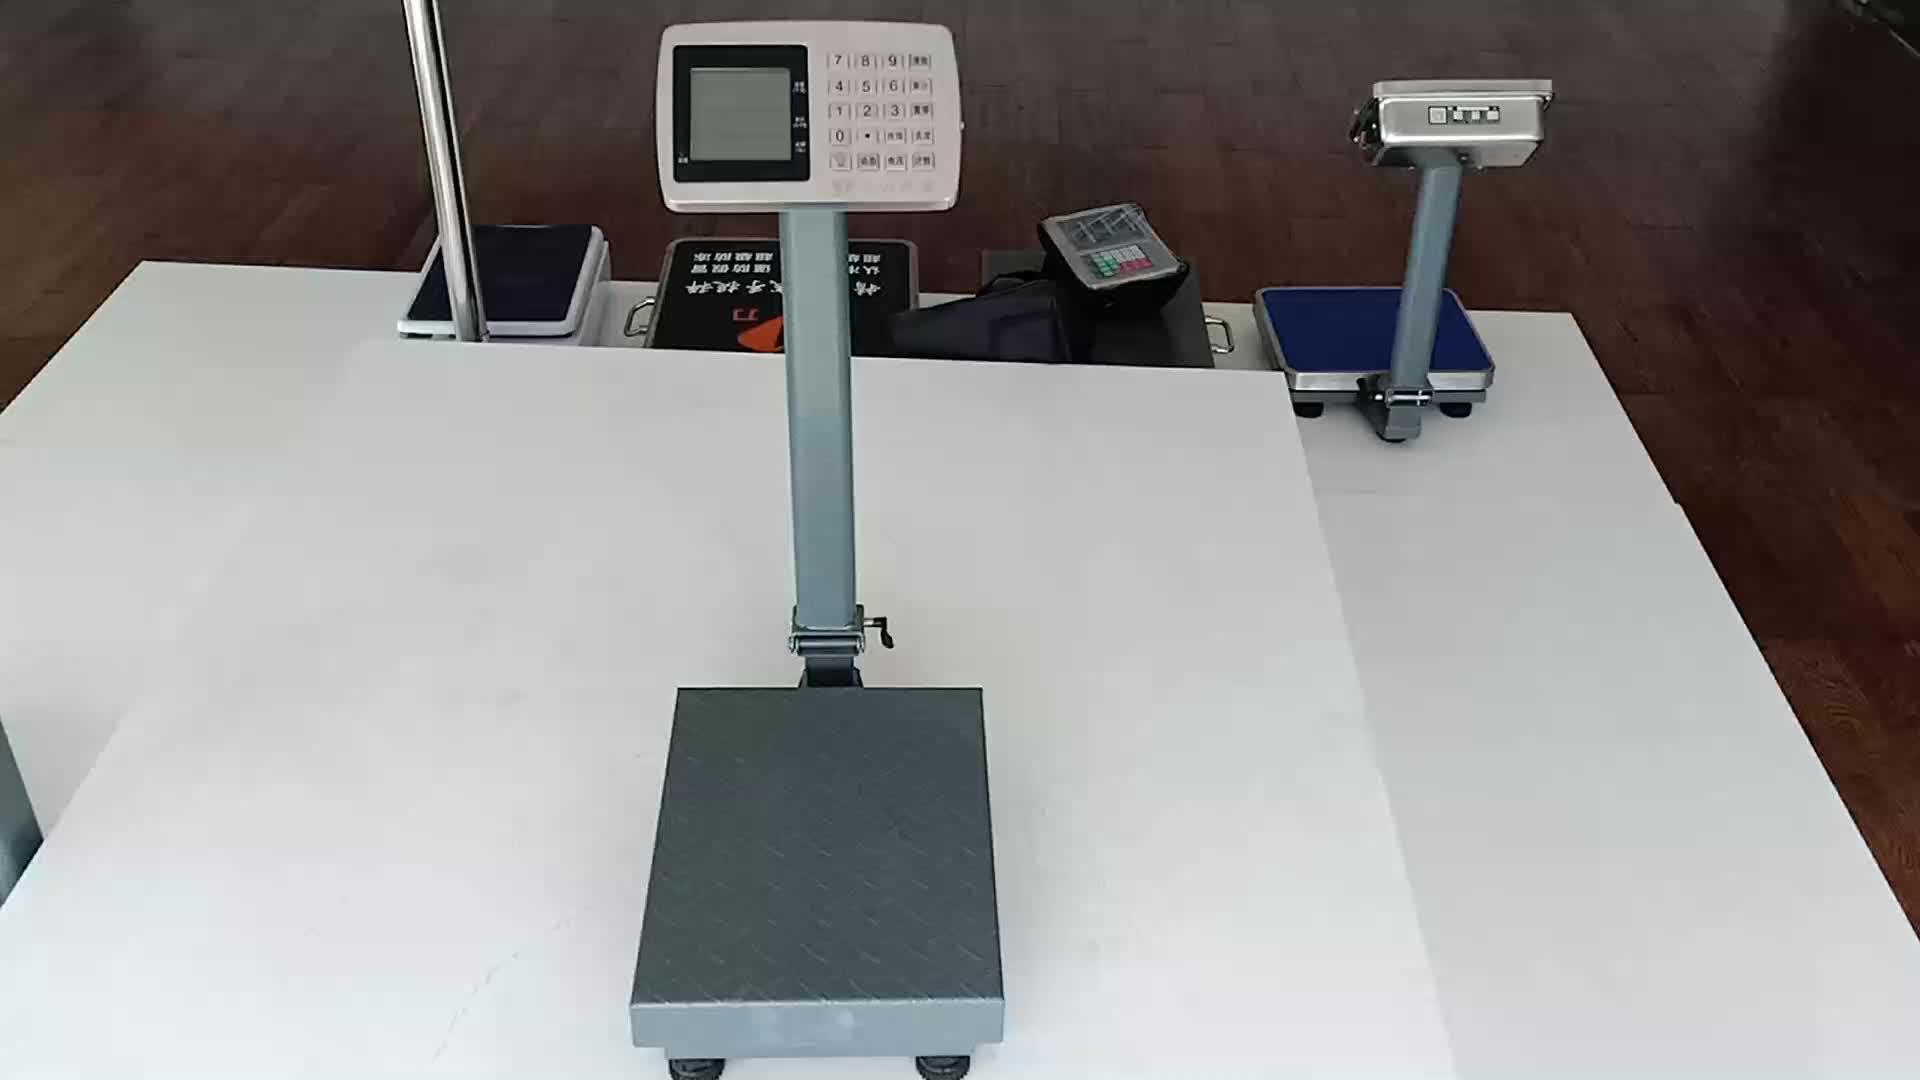 Digital Price Platform  Weighing Scale With Big Display